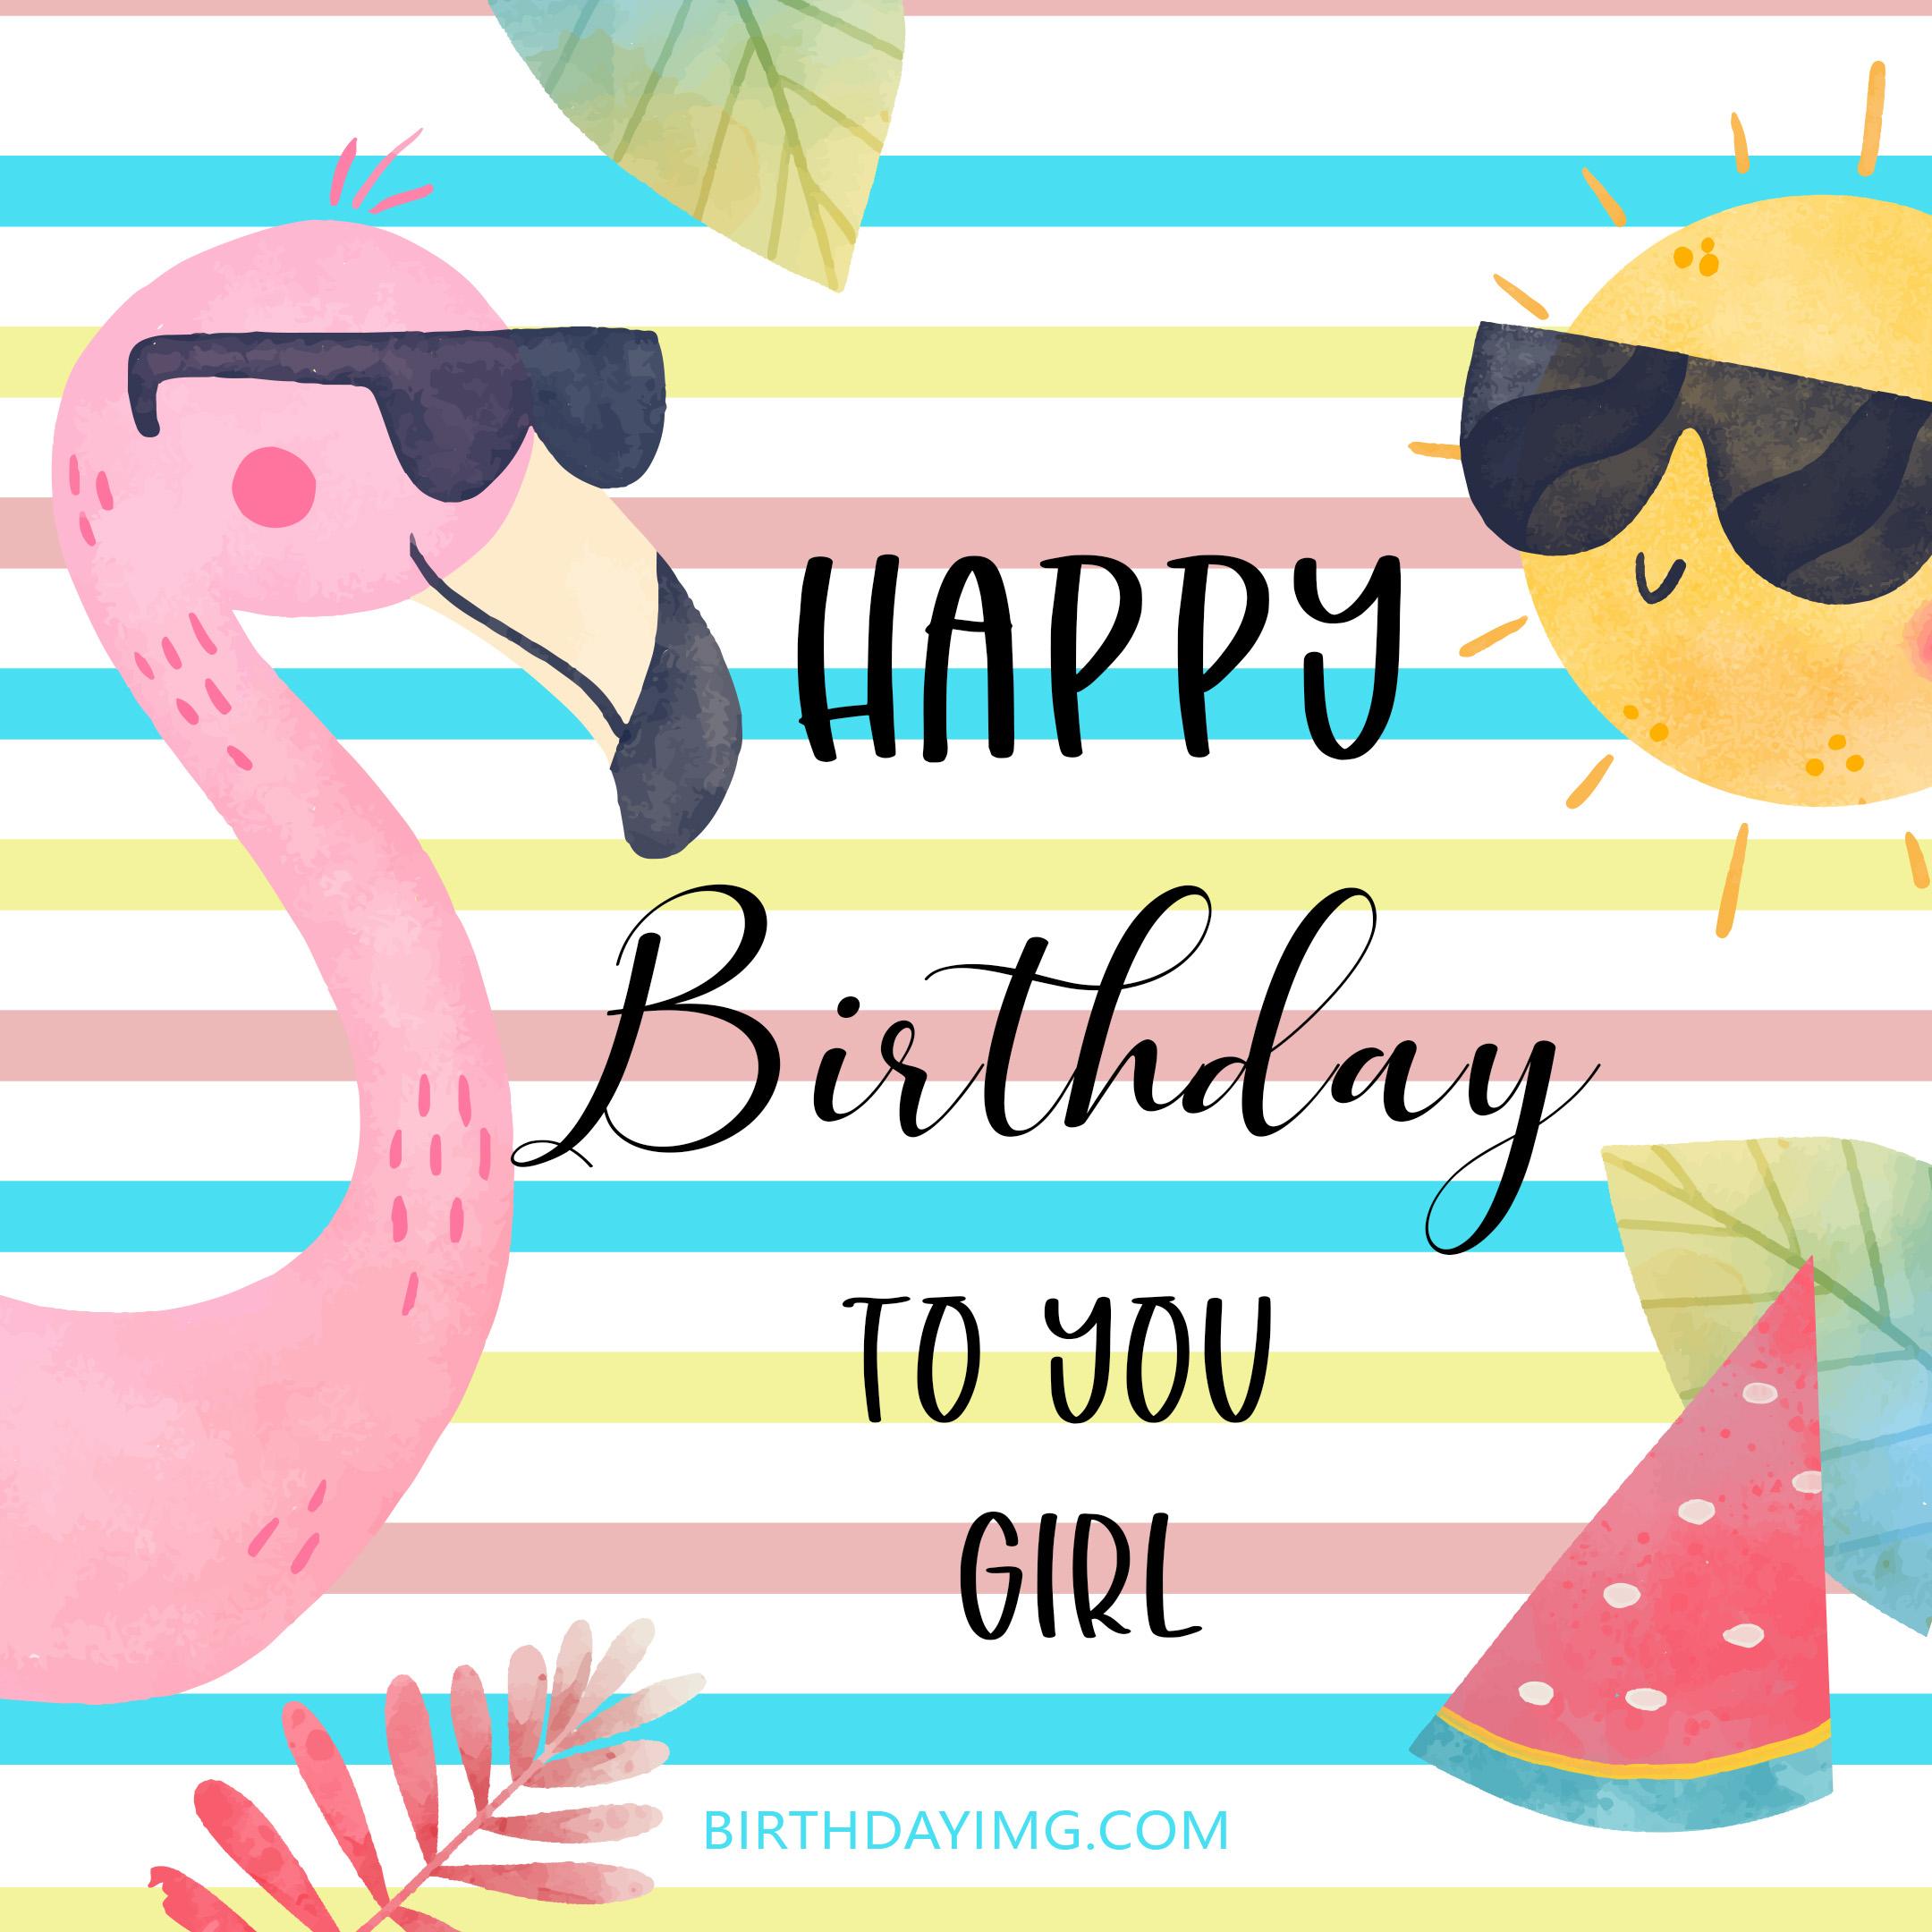 Free Cute Happy Birthday Image For Girl With Flamingo - birthdayimg.com